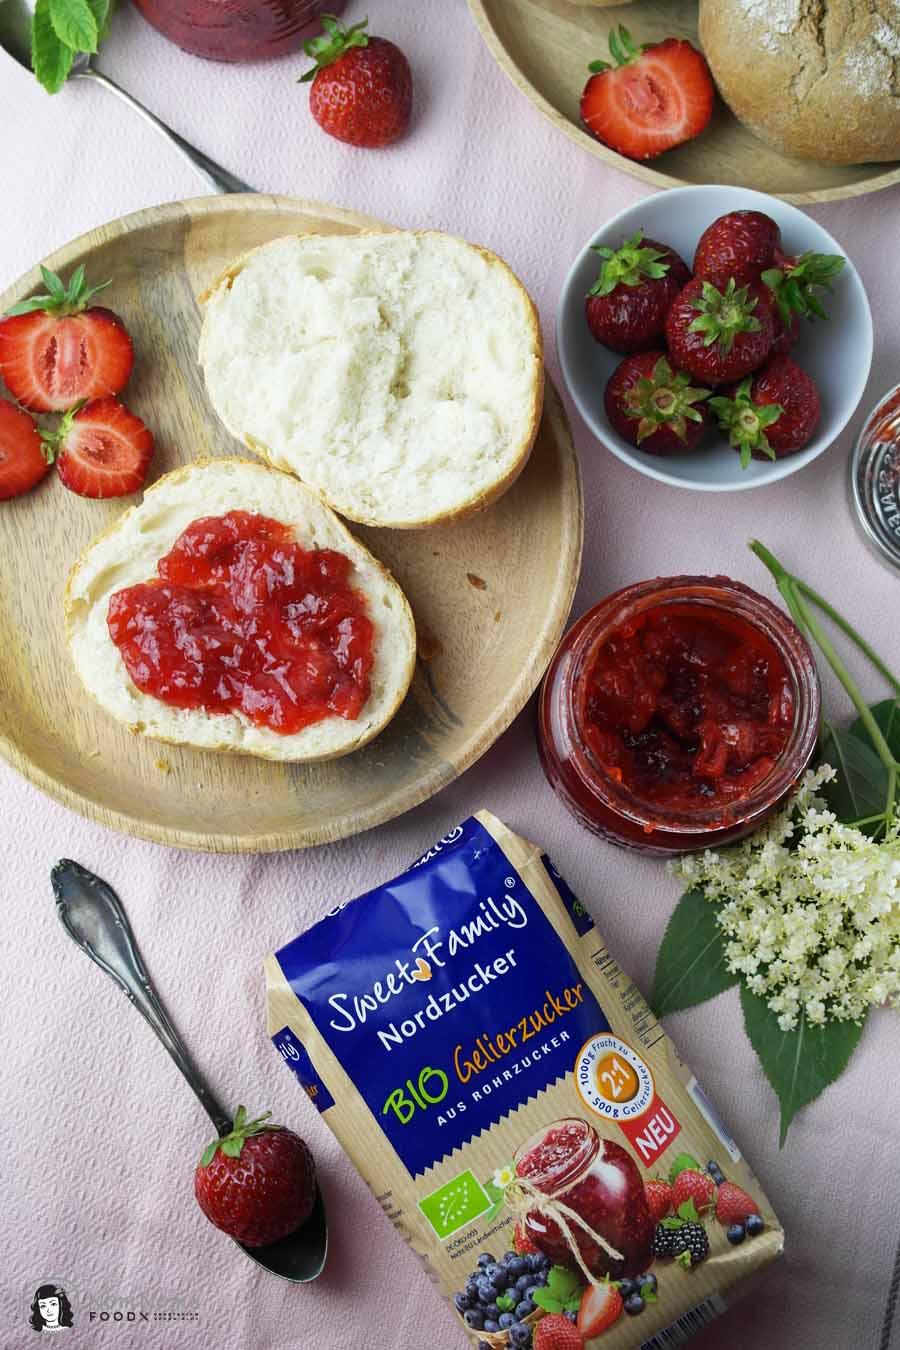 Erdbeer-Minze-Marmelade und Erdbeer-Holunderblüten-Marmelade ❤